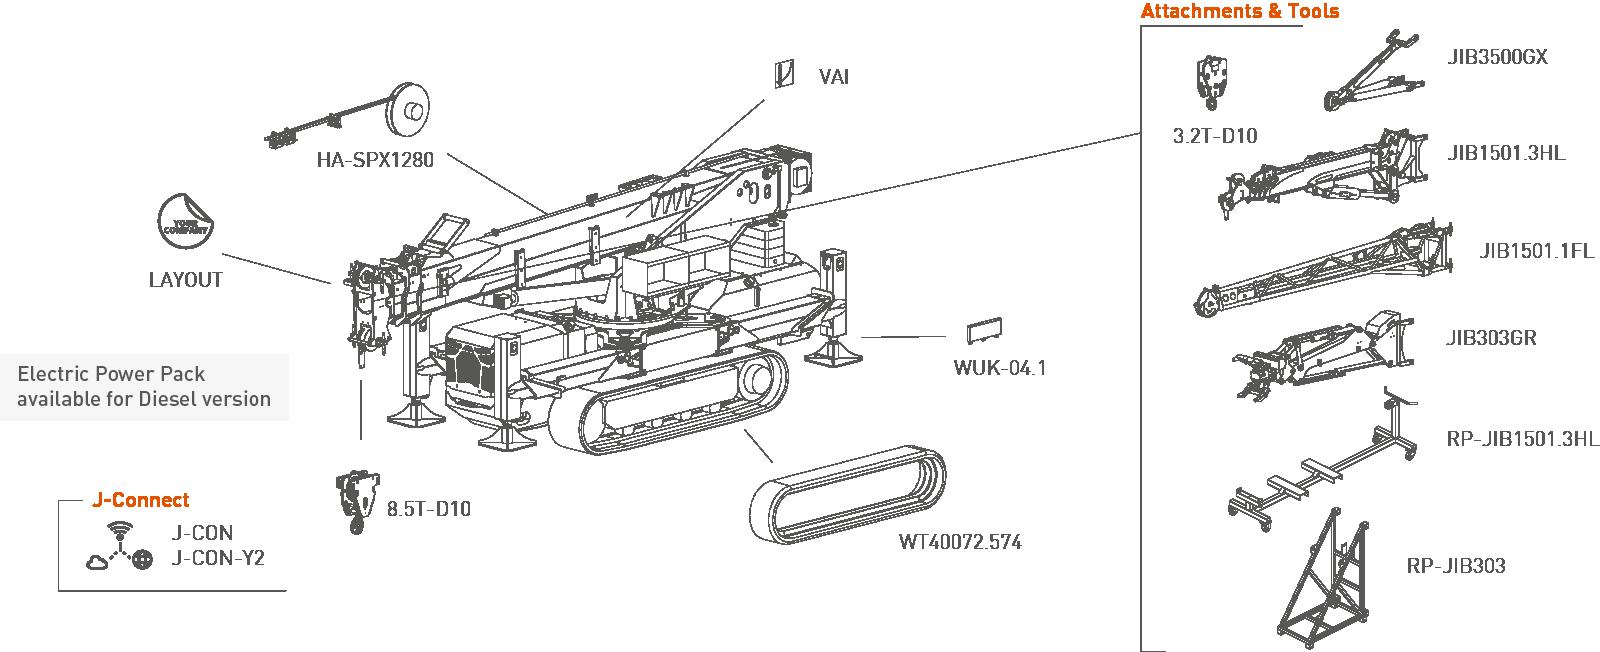 SPX1280 jekko mini kran